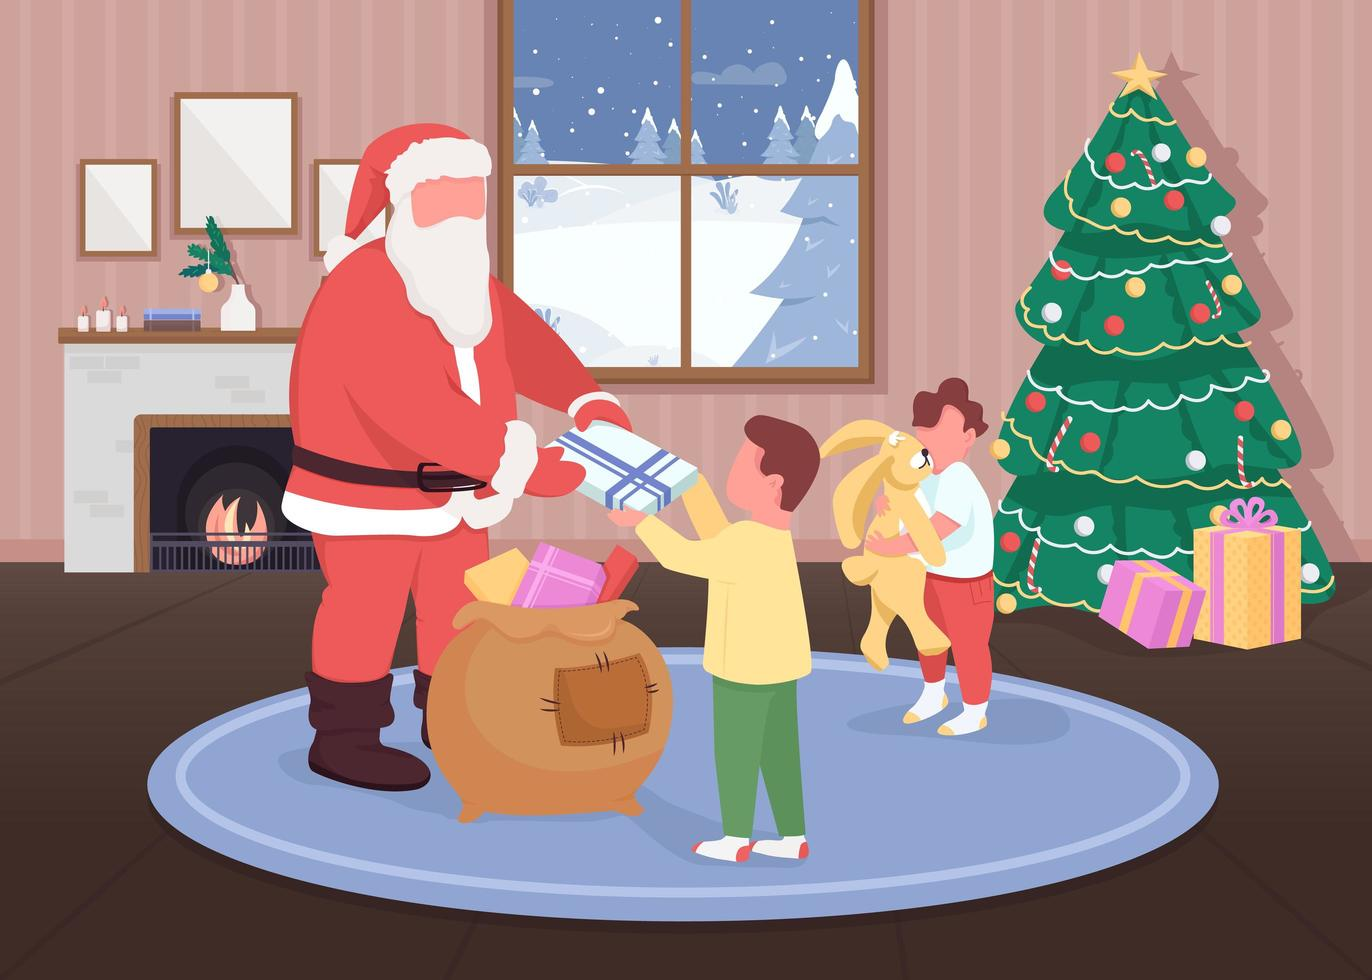 Santa gibt Kindern Geschenke vektor